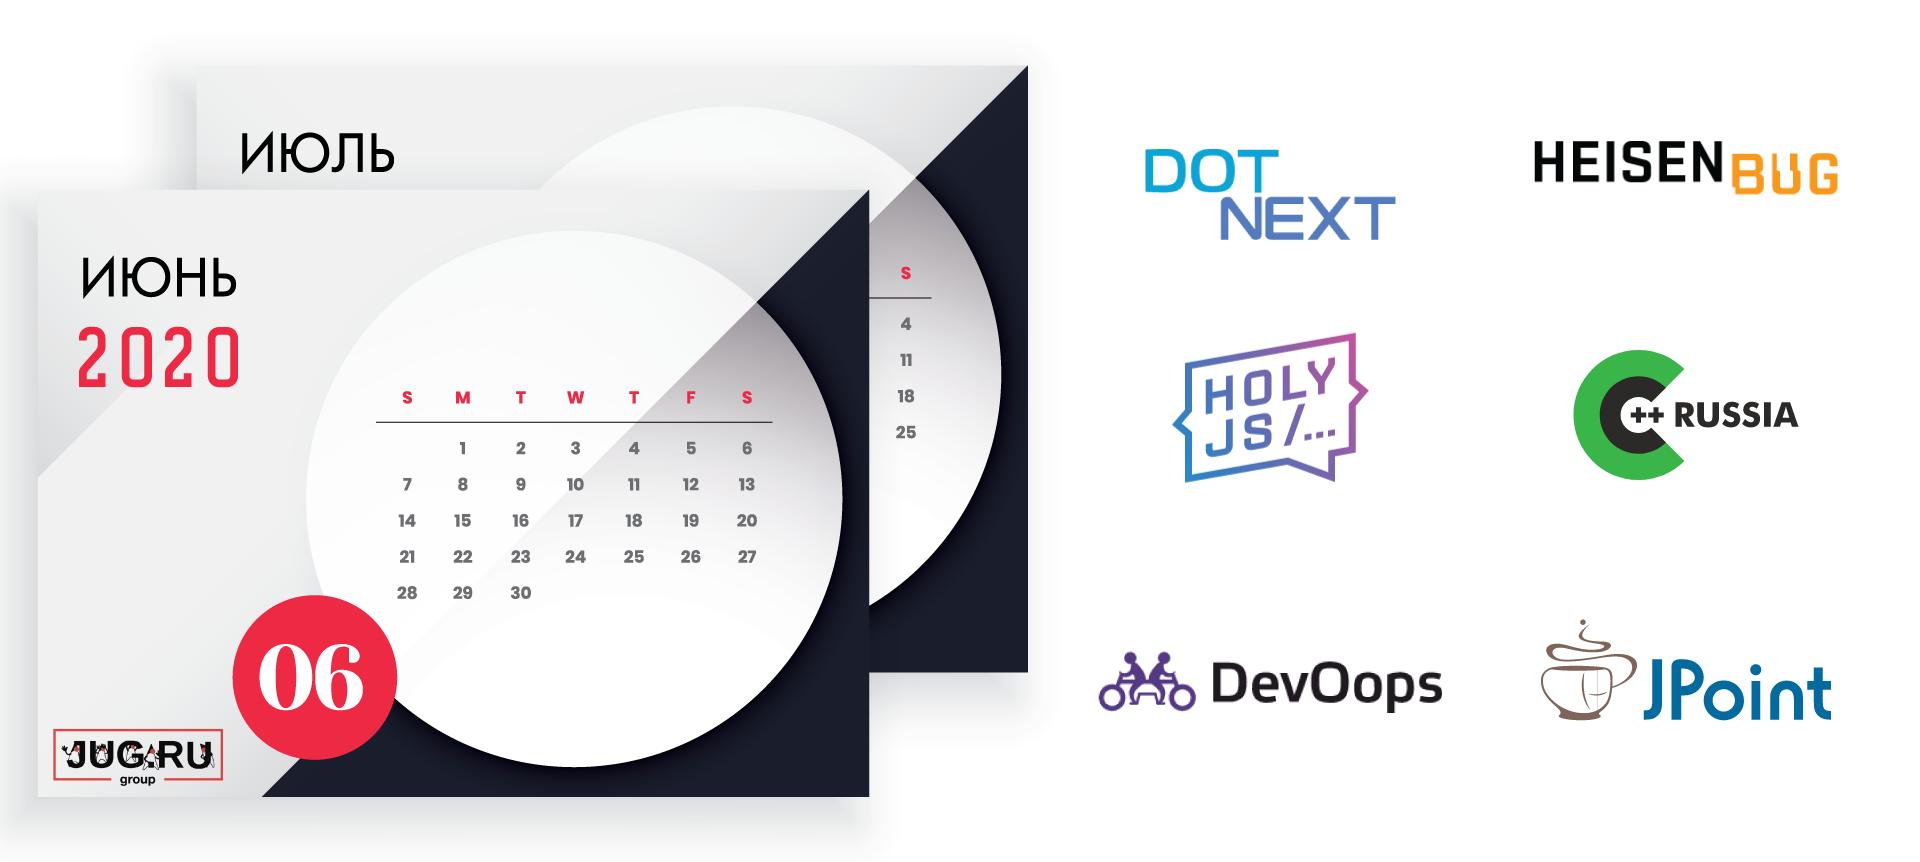 Конференции DotNext, Heisenbug, HolyJS, C++ Russia, DevOops и JPoint переносятся из-за коронавируса - 1